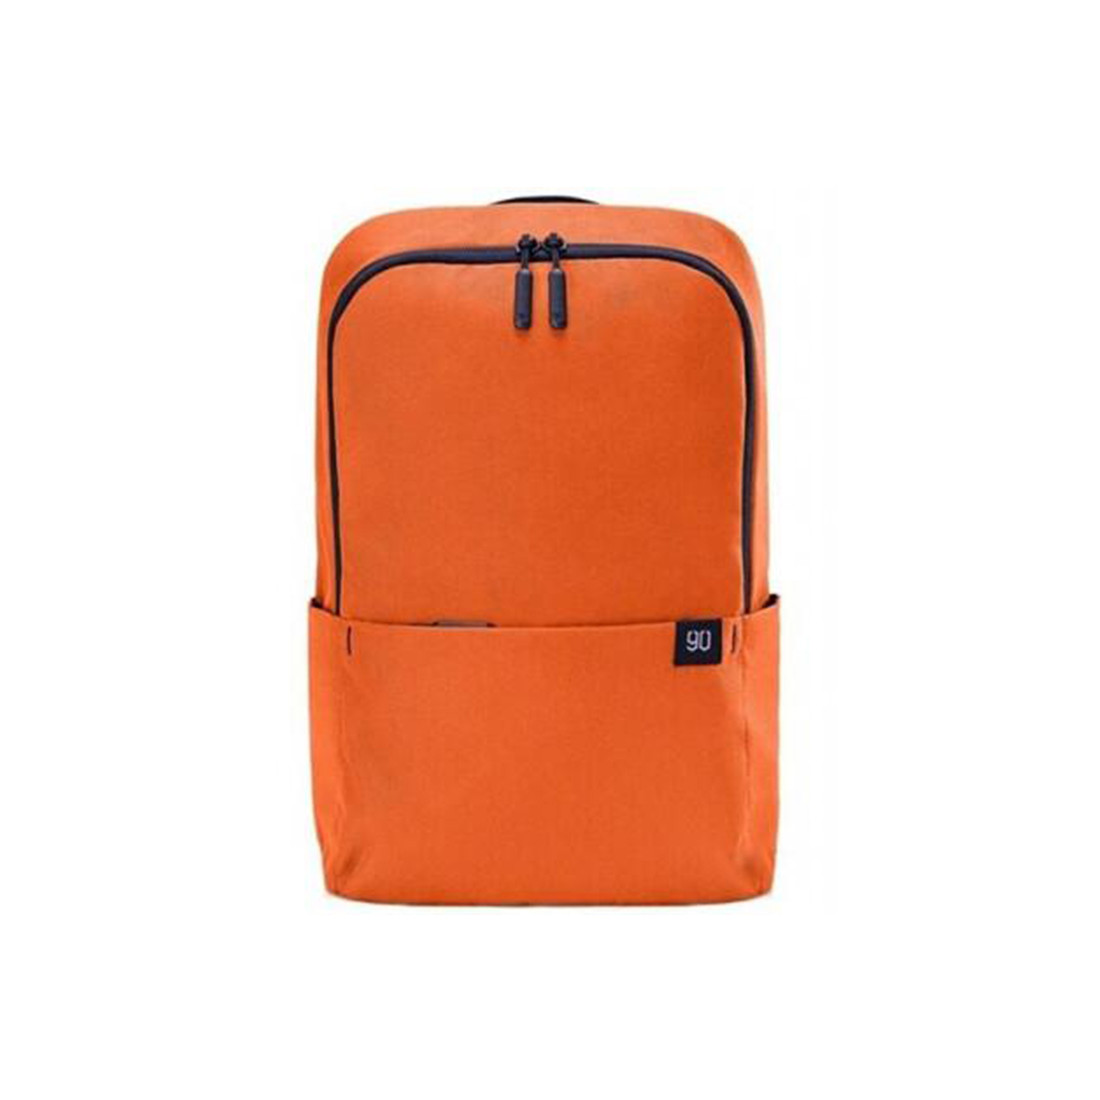 Рюкзак Xiaomi 90Go Tiny Lightweight Casual Backpack, 6972125146489,